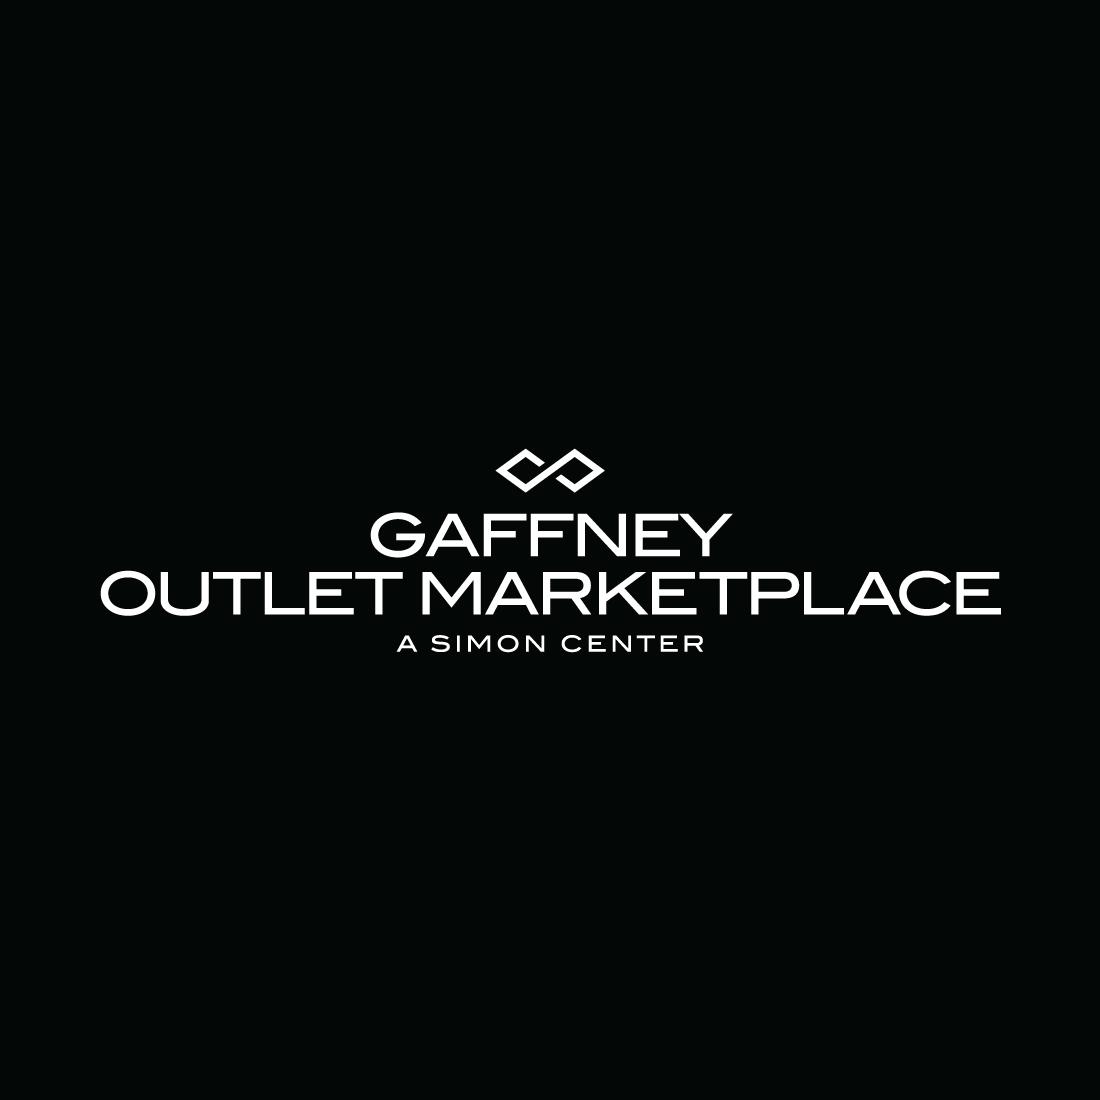 Gaffney Outlet Marketplace